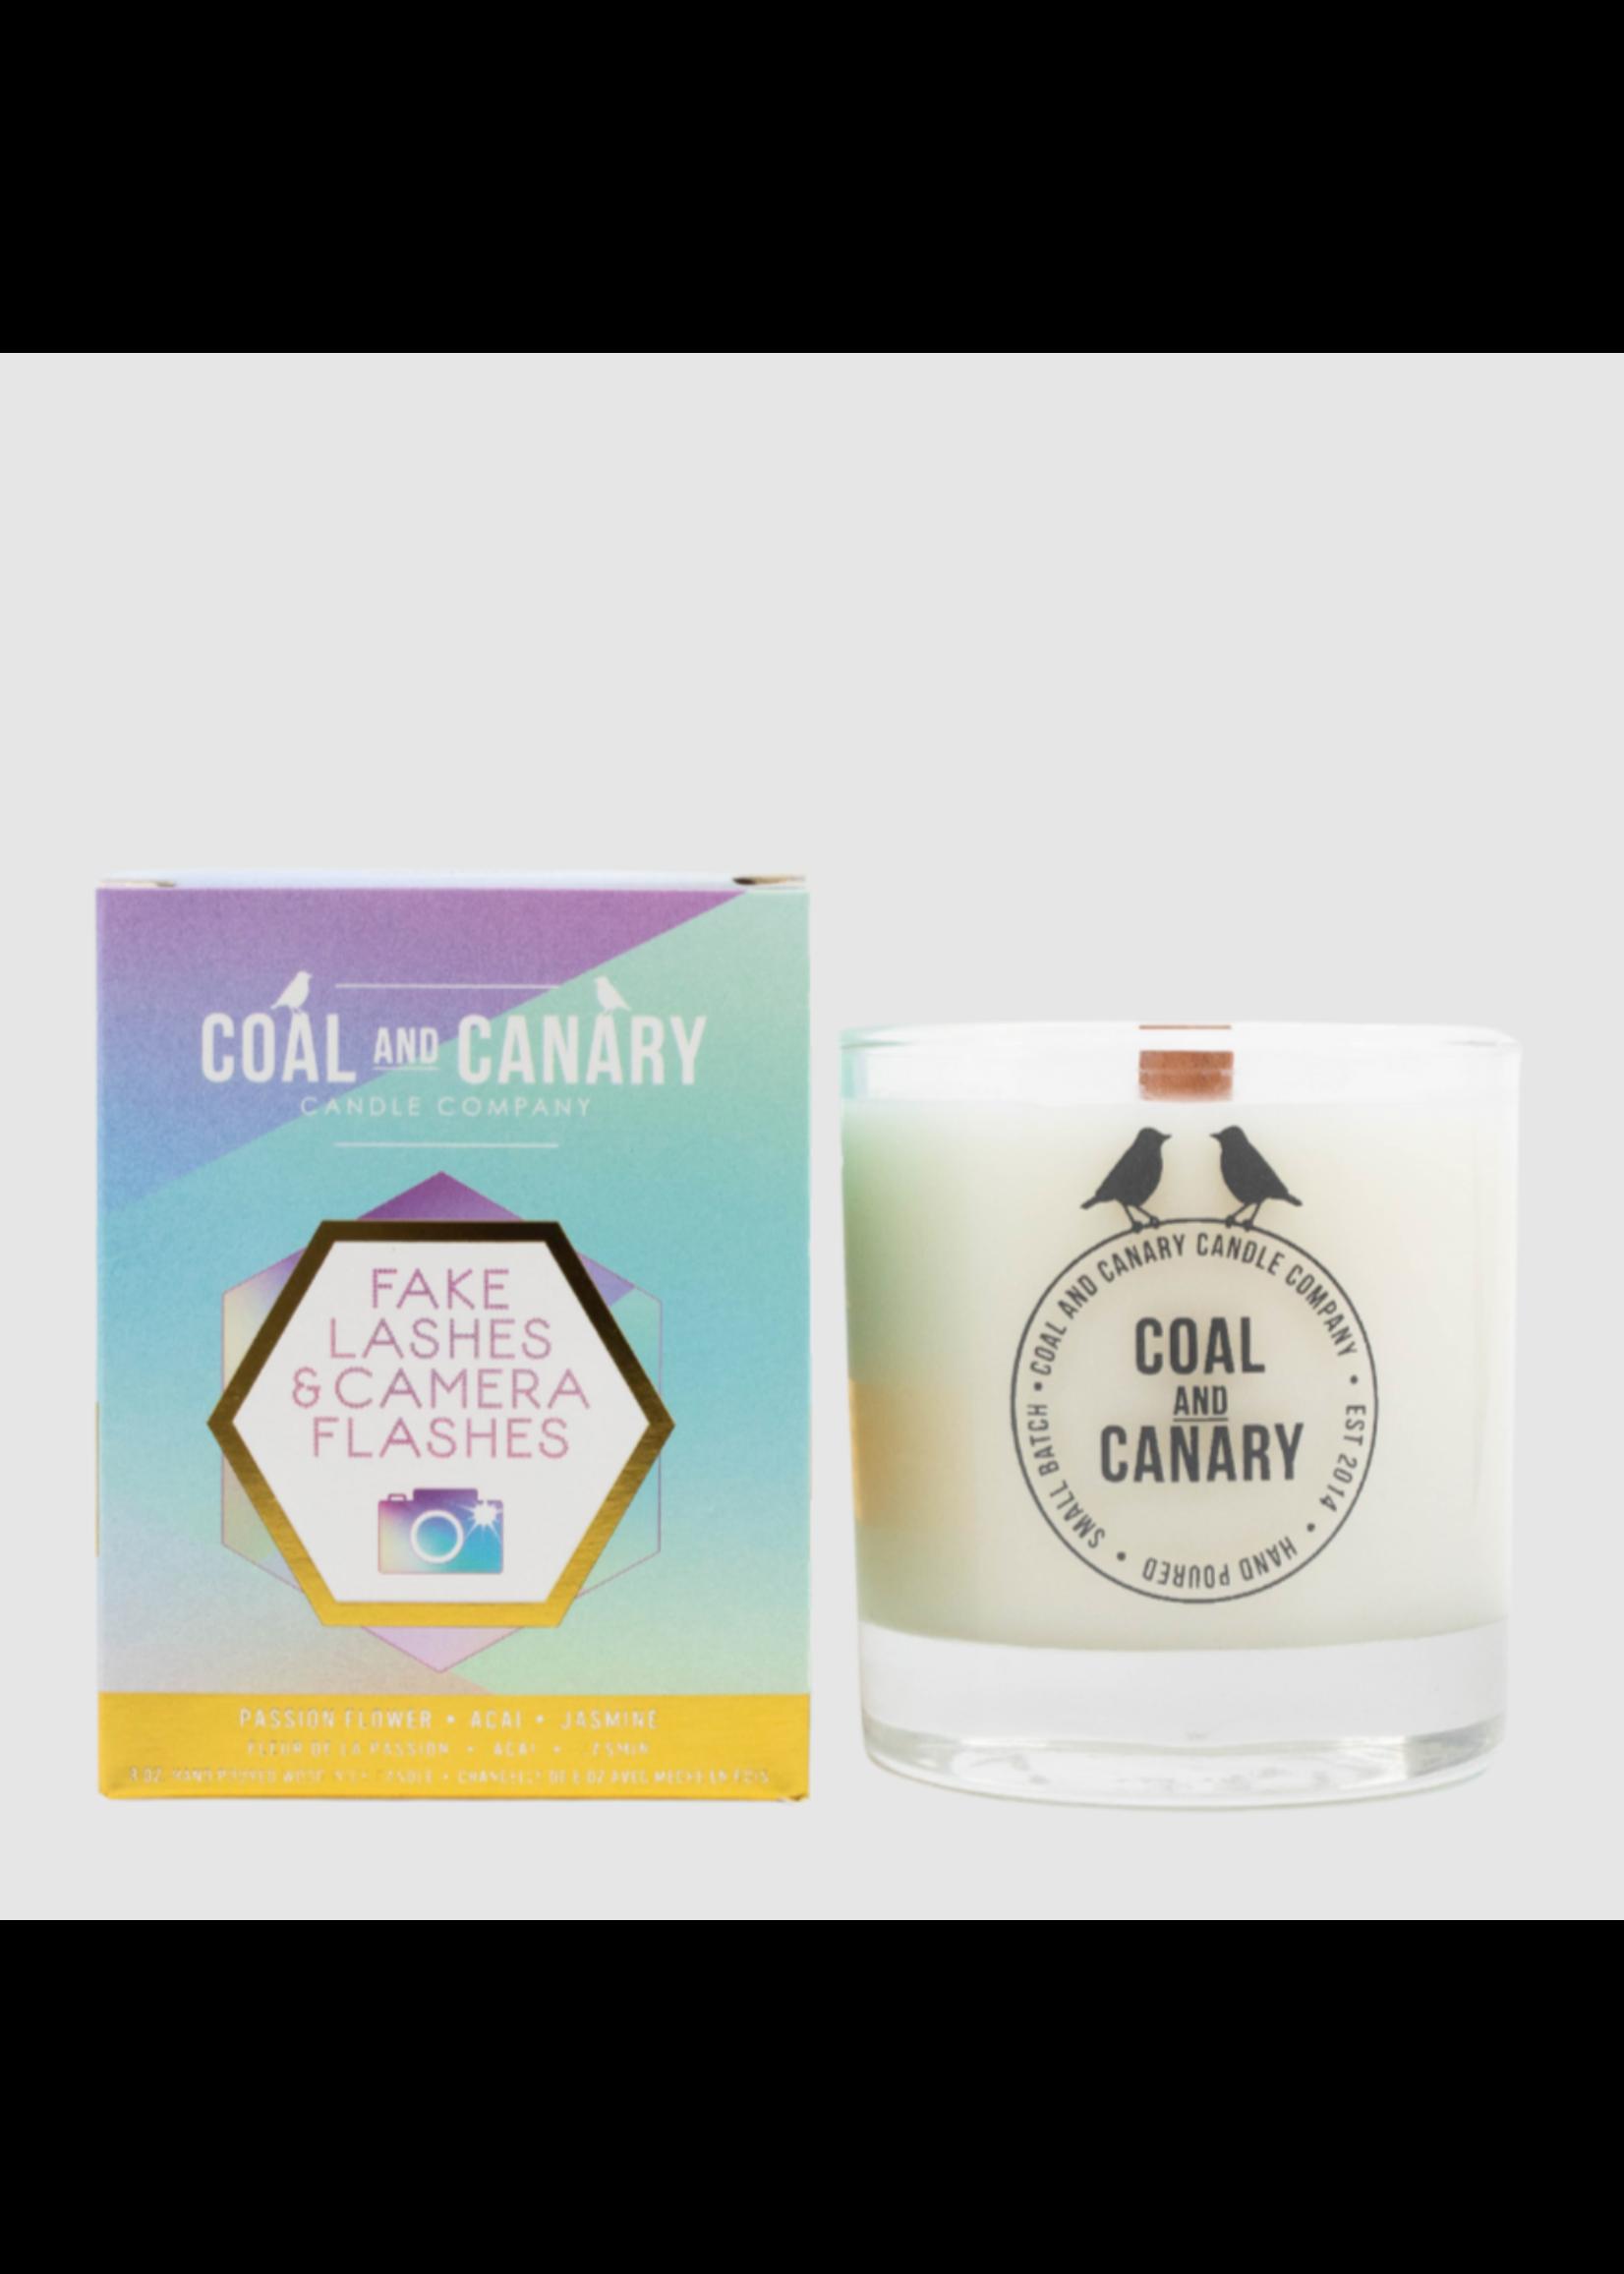 Coal and Canary Fake Lashes & Camera Flashes